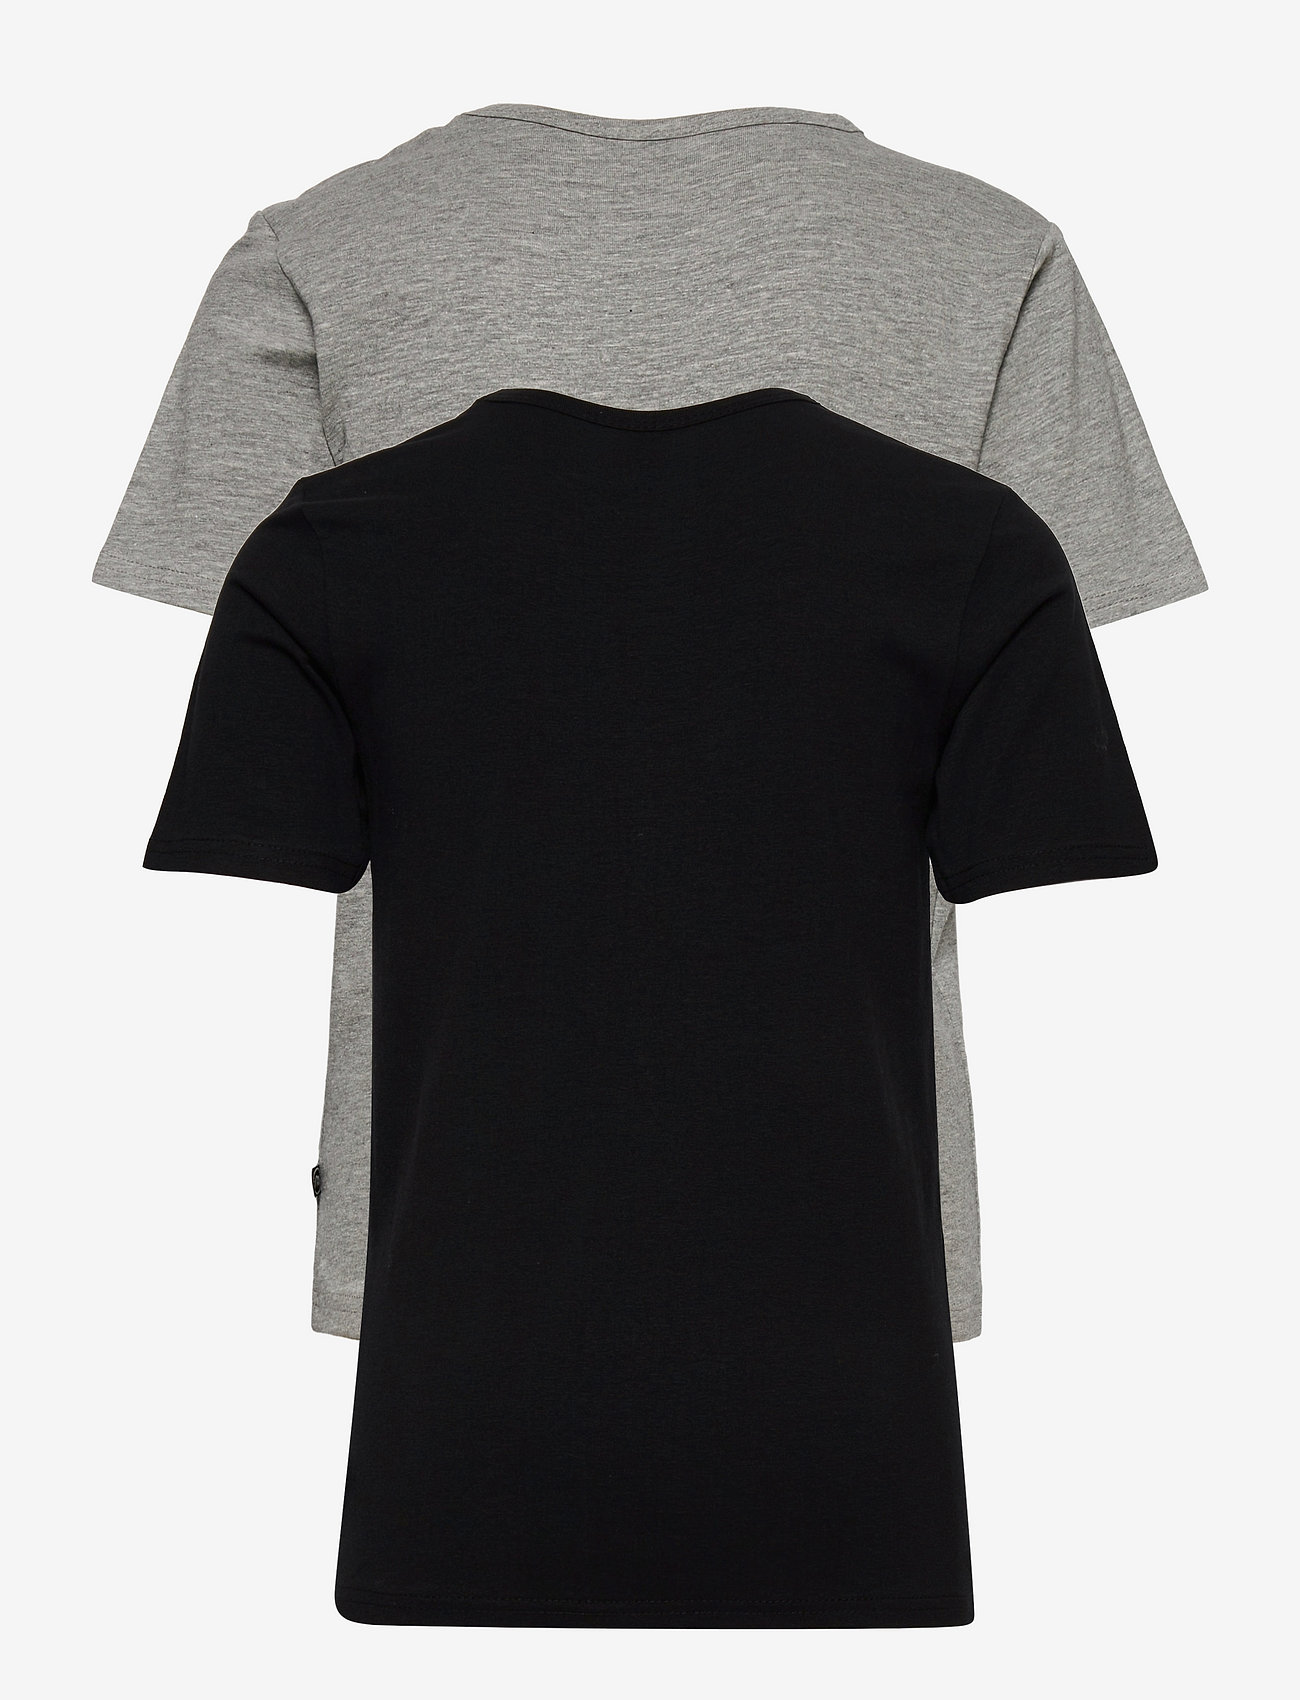 Minymo - Basic 32 -T-shirt SS (2-pack) - krótki rękaw - anthacite black - 1